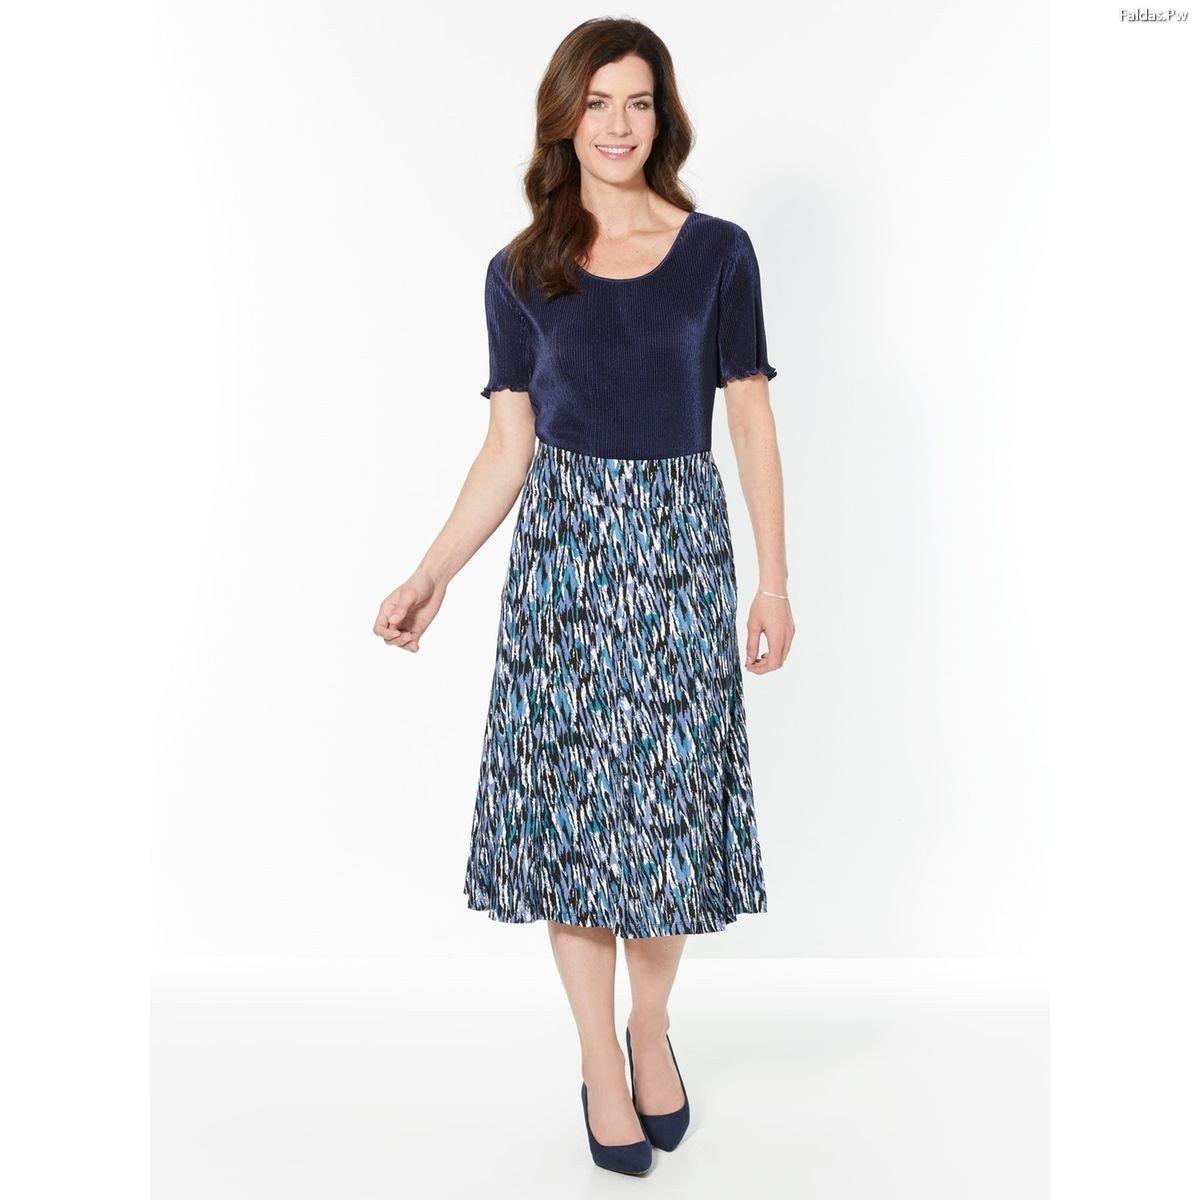 0085dcb9e Faldas Abajo de la Rodilla ¡Bonitos Modelos! | Faldas | Moda 2019 - 2020